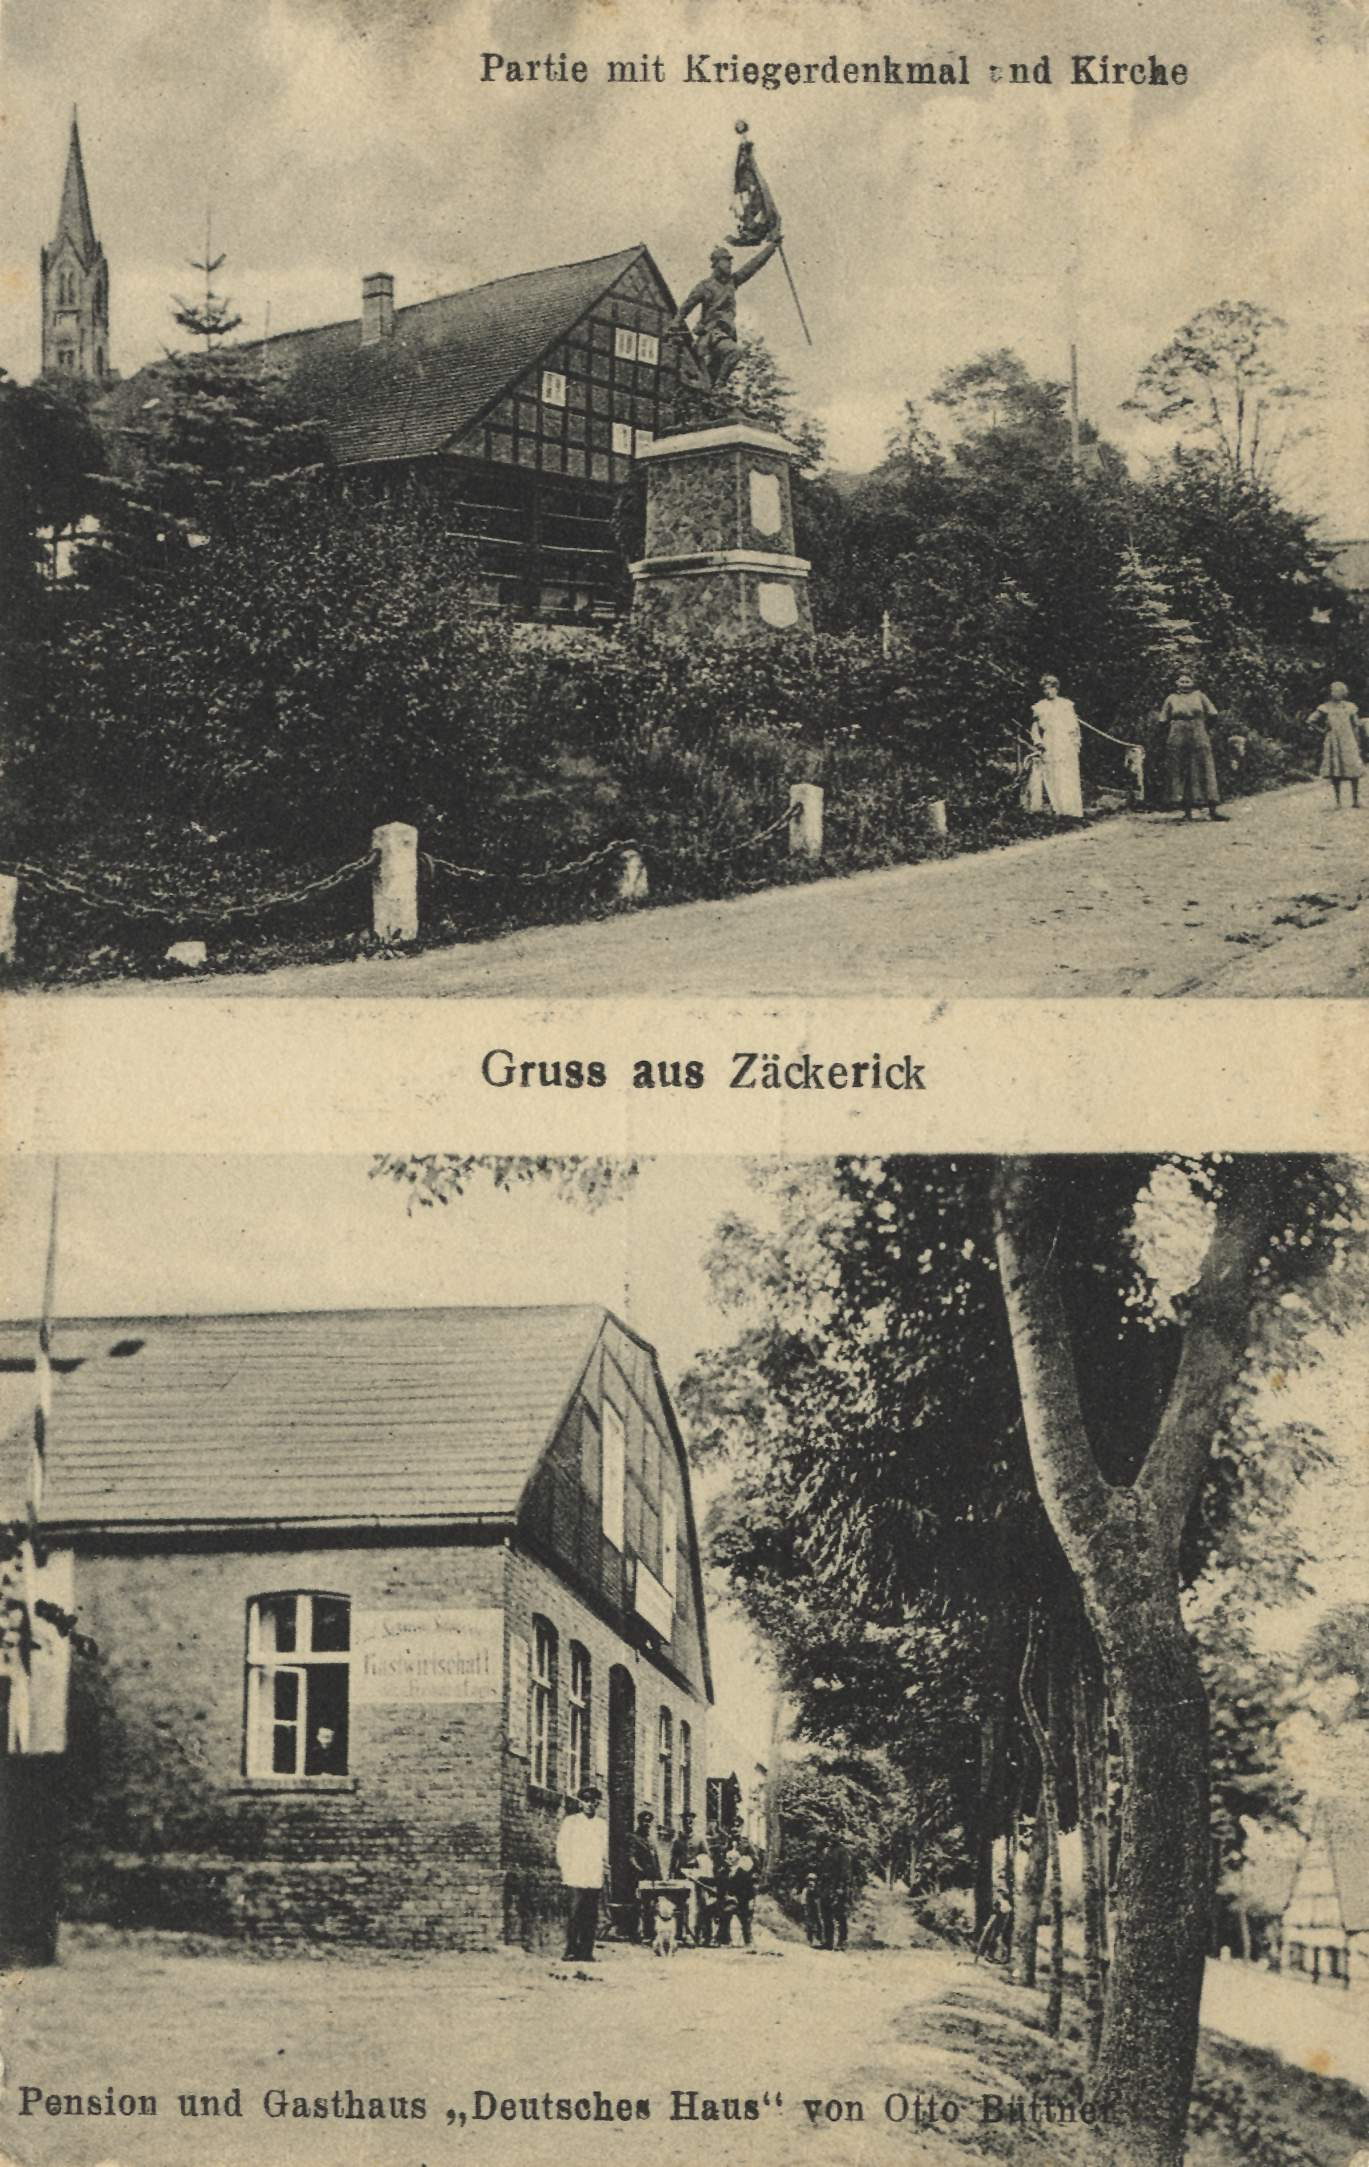 http://images.zeno.org/Ansichtskarten/I/big/AK09976a.jpg